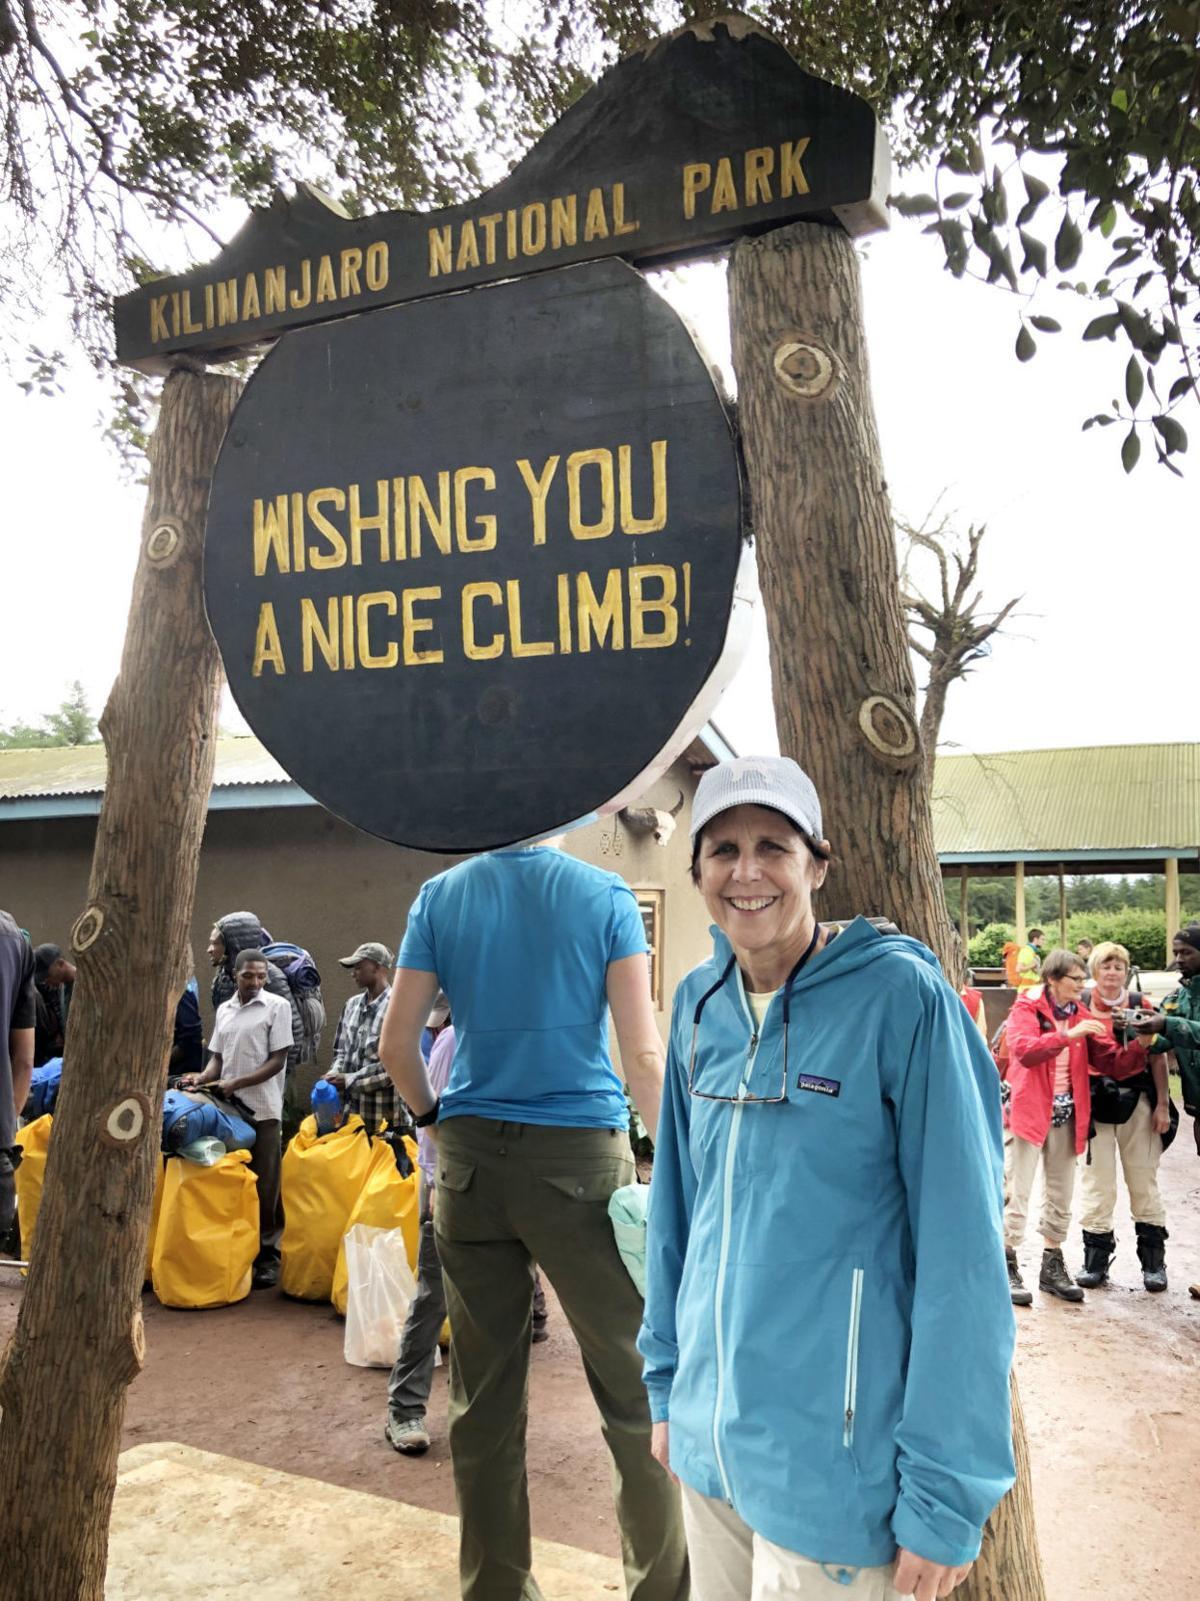 Koehler-Kilimanjaro